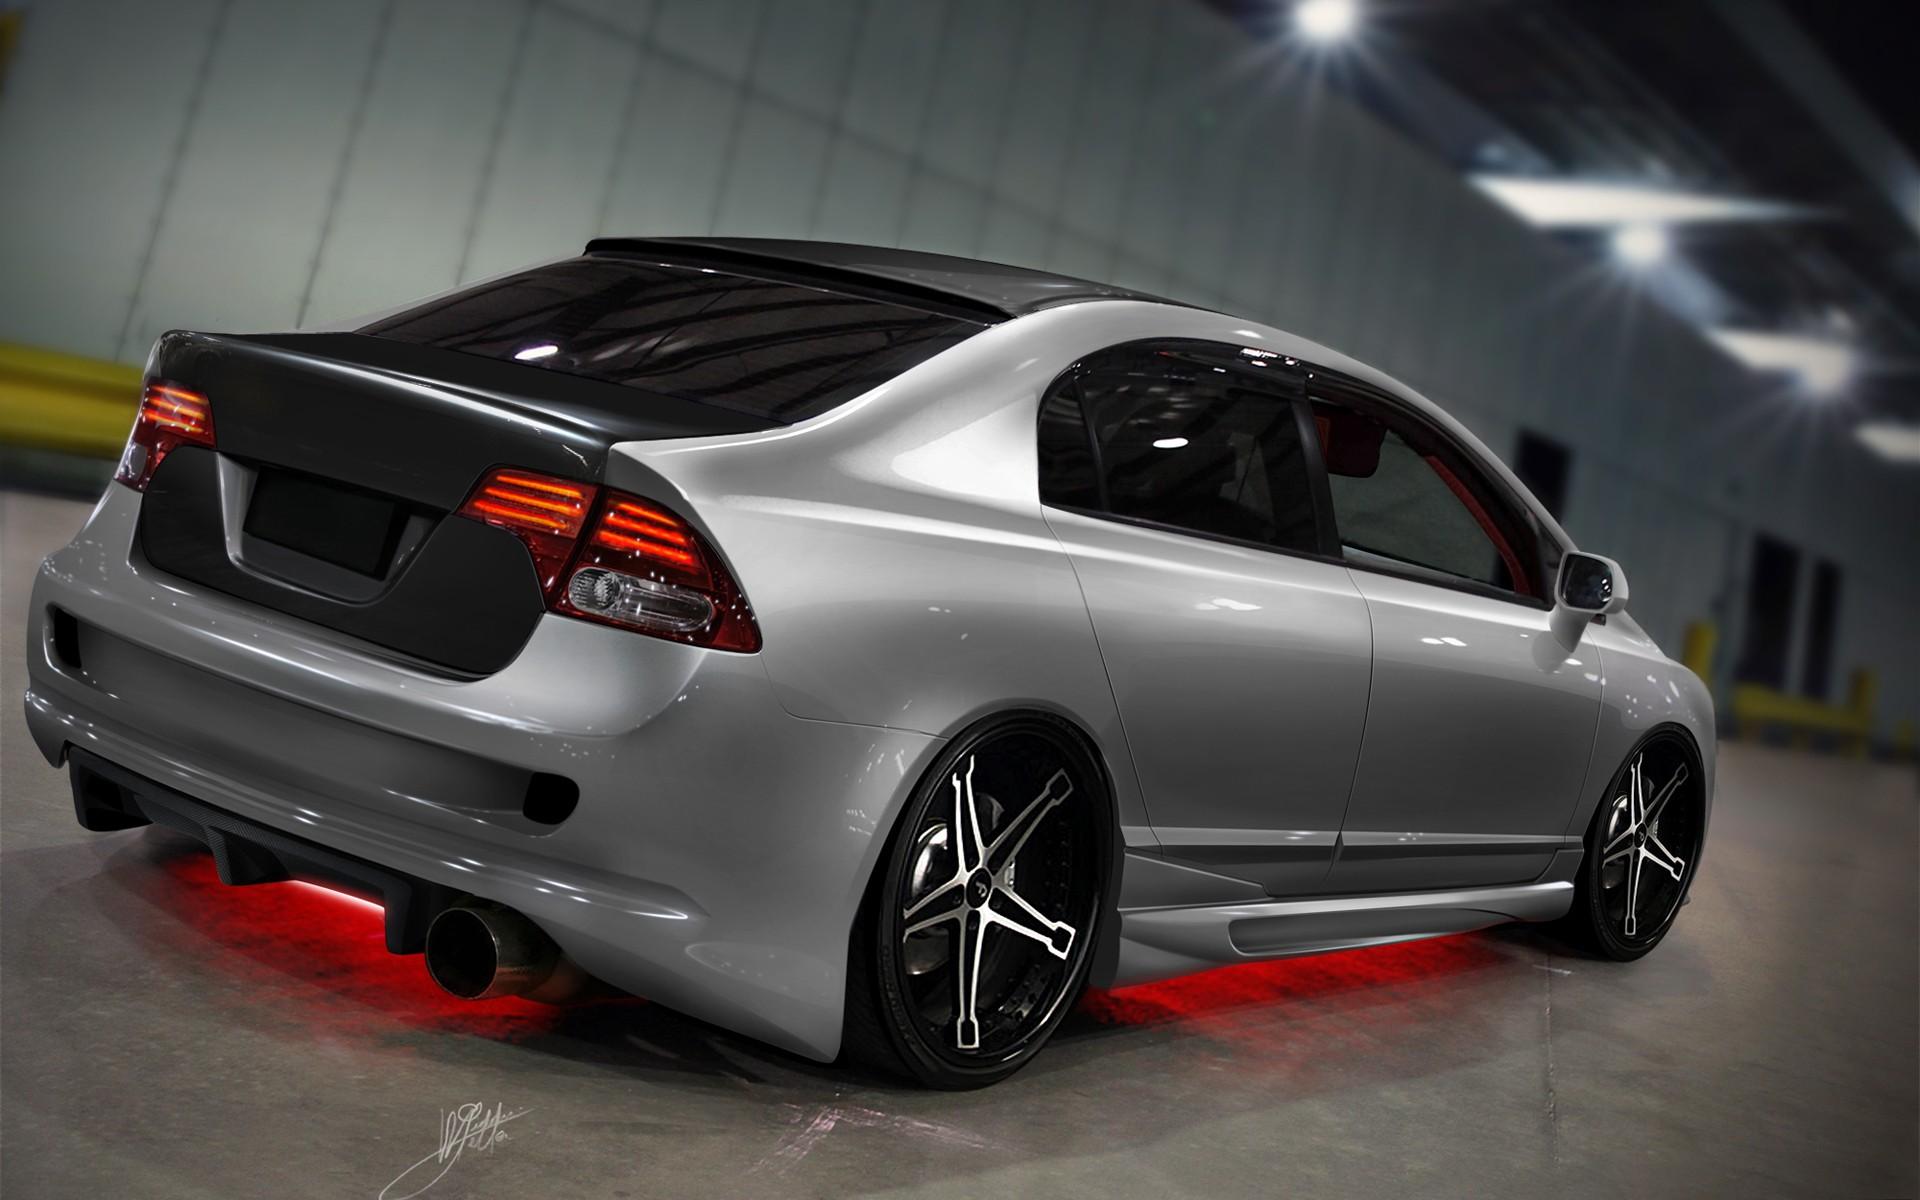 Wallpaper Neon Honda Civic Tuning Type R Sedan Wheel Rim 1920x1200 Px Light Land Vehicle Automotive Design Exterior